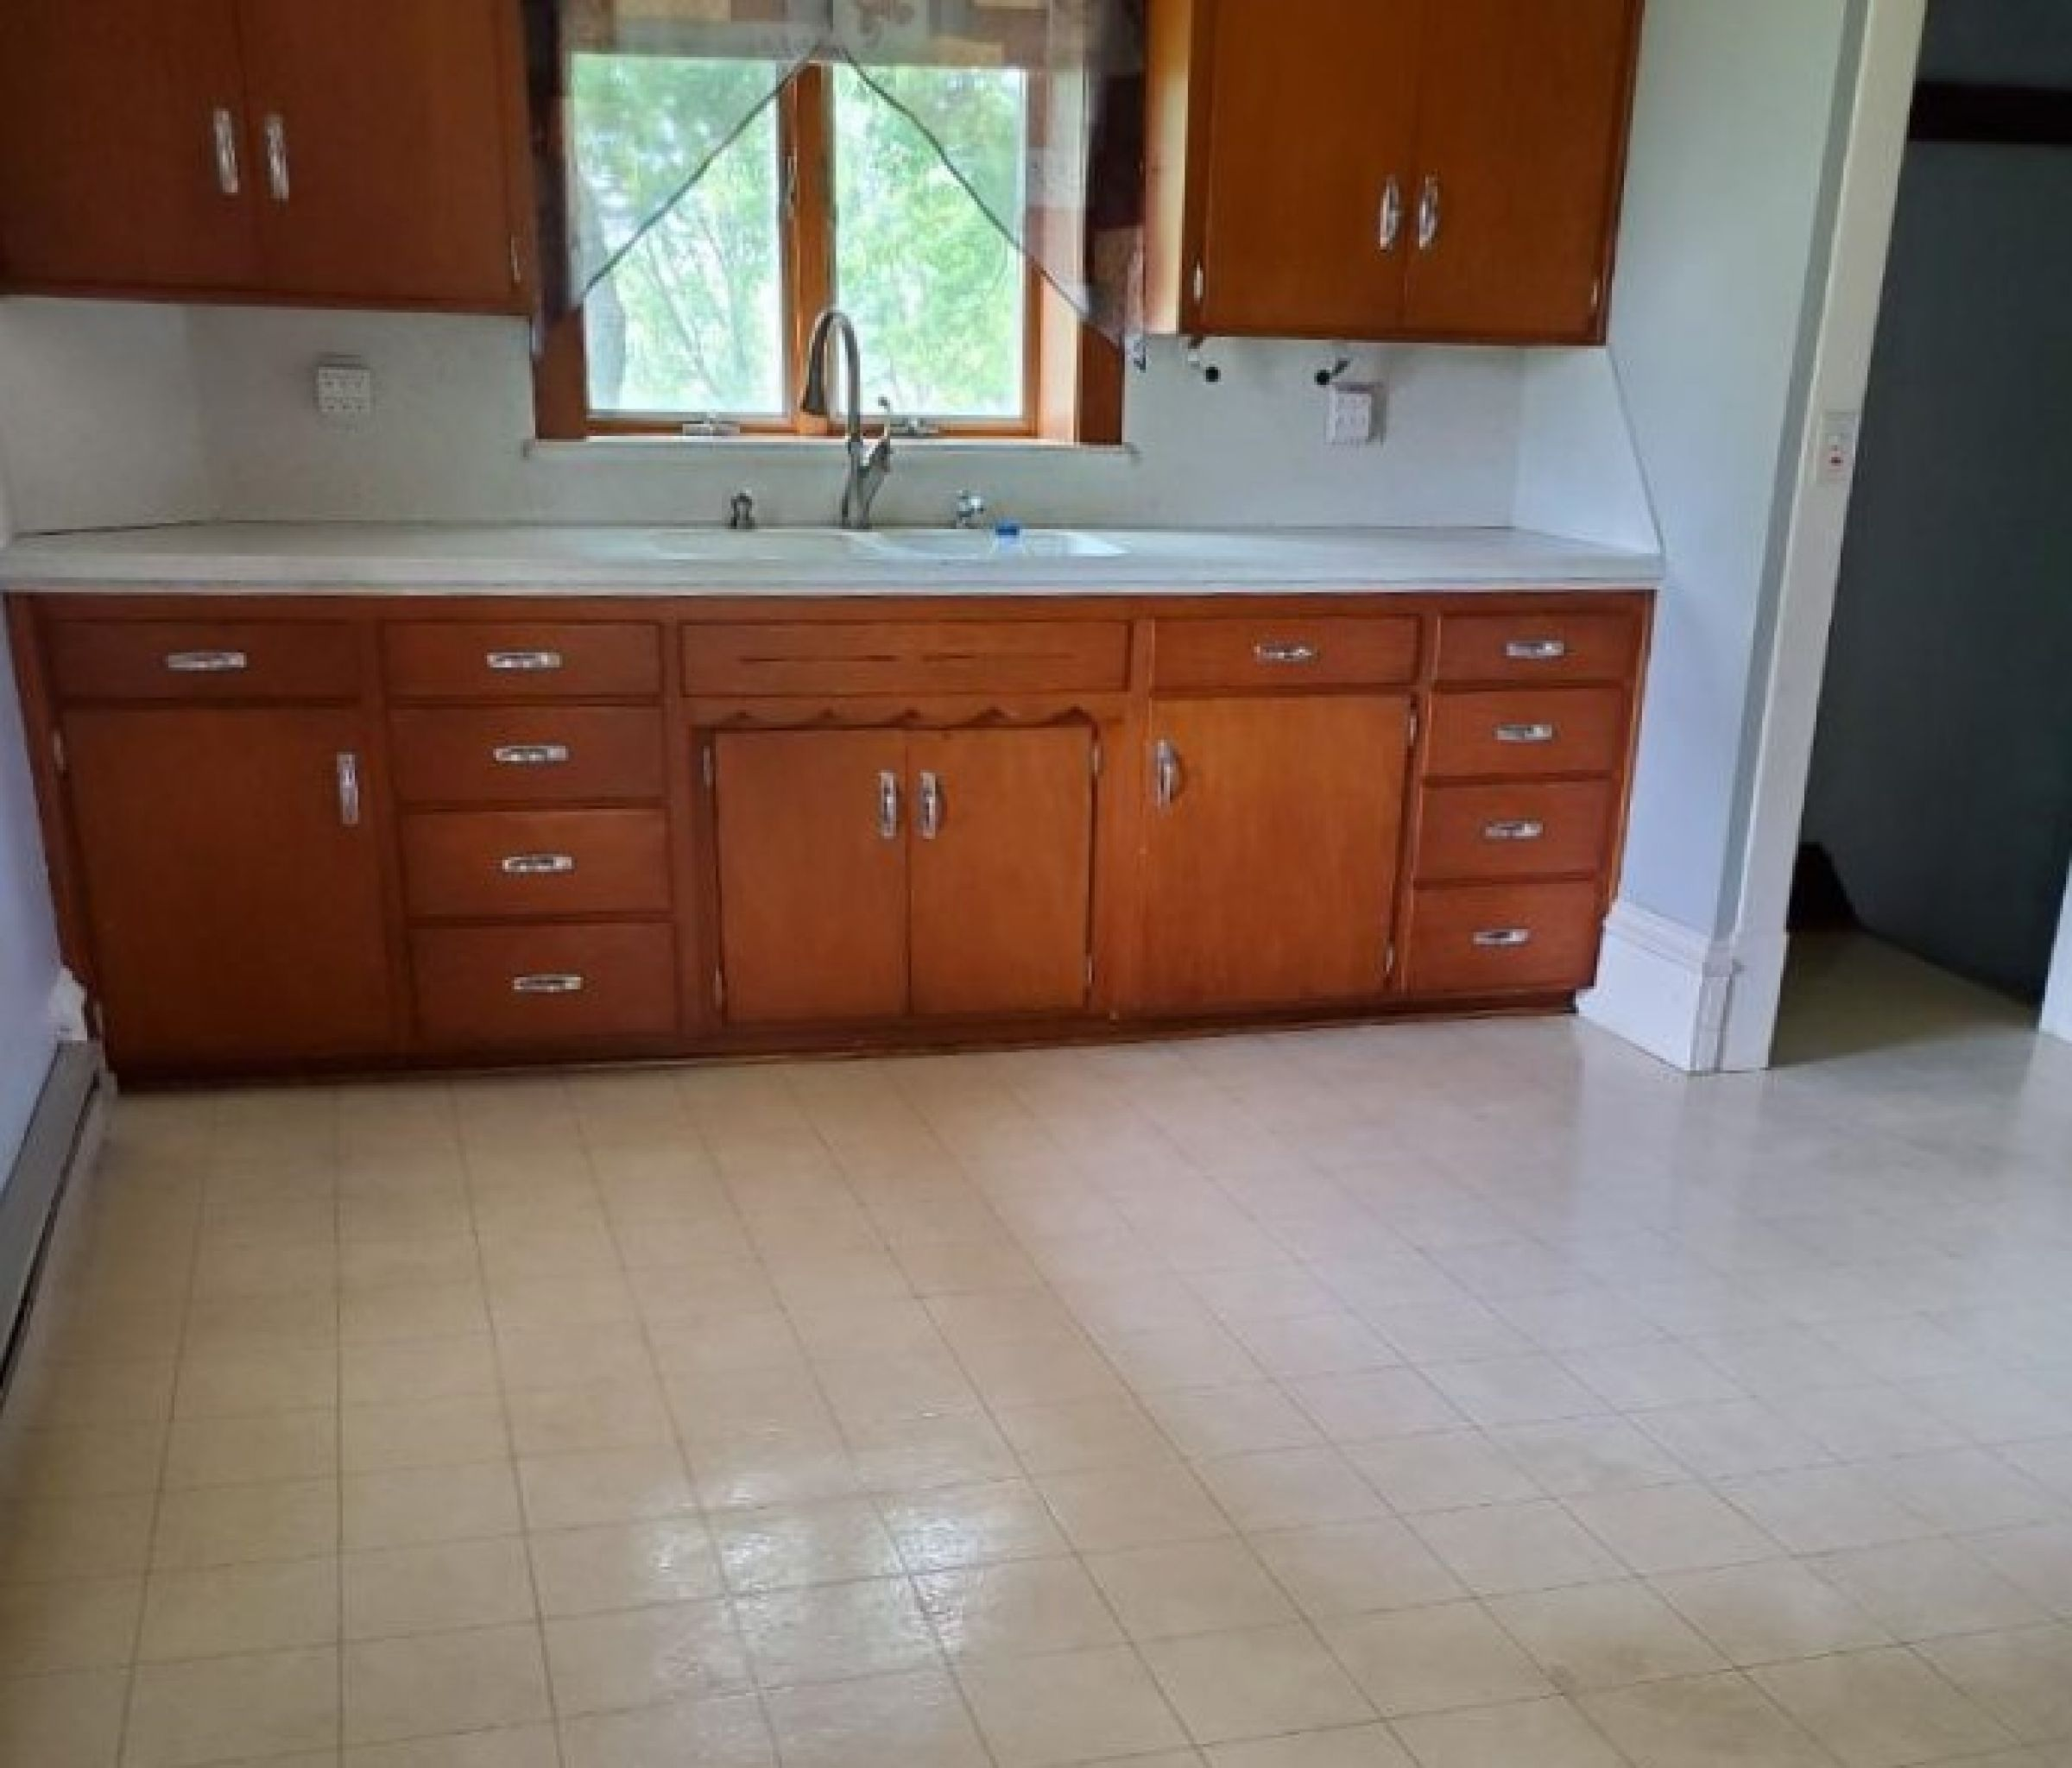 residential-land-mcleod-county-minnesota-80-acres-listing-number-15182-7-2020-09-23-163826.jpeg